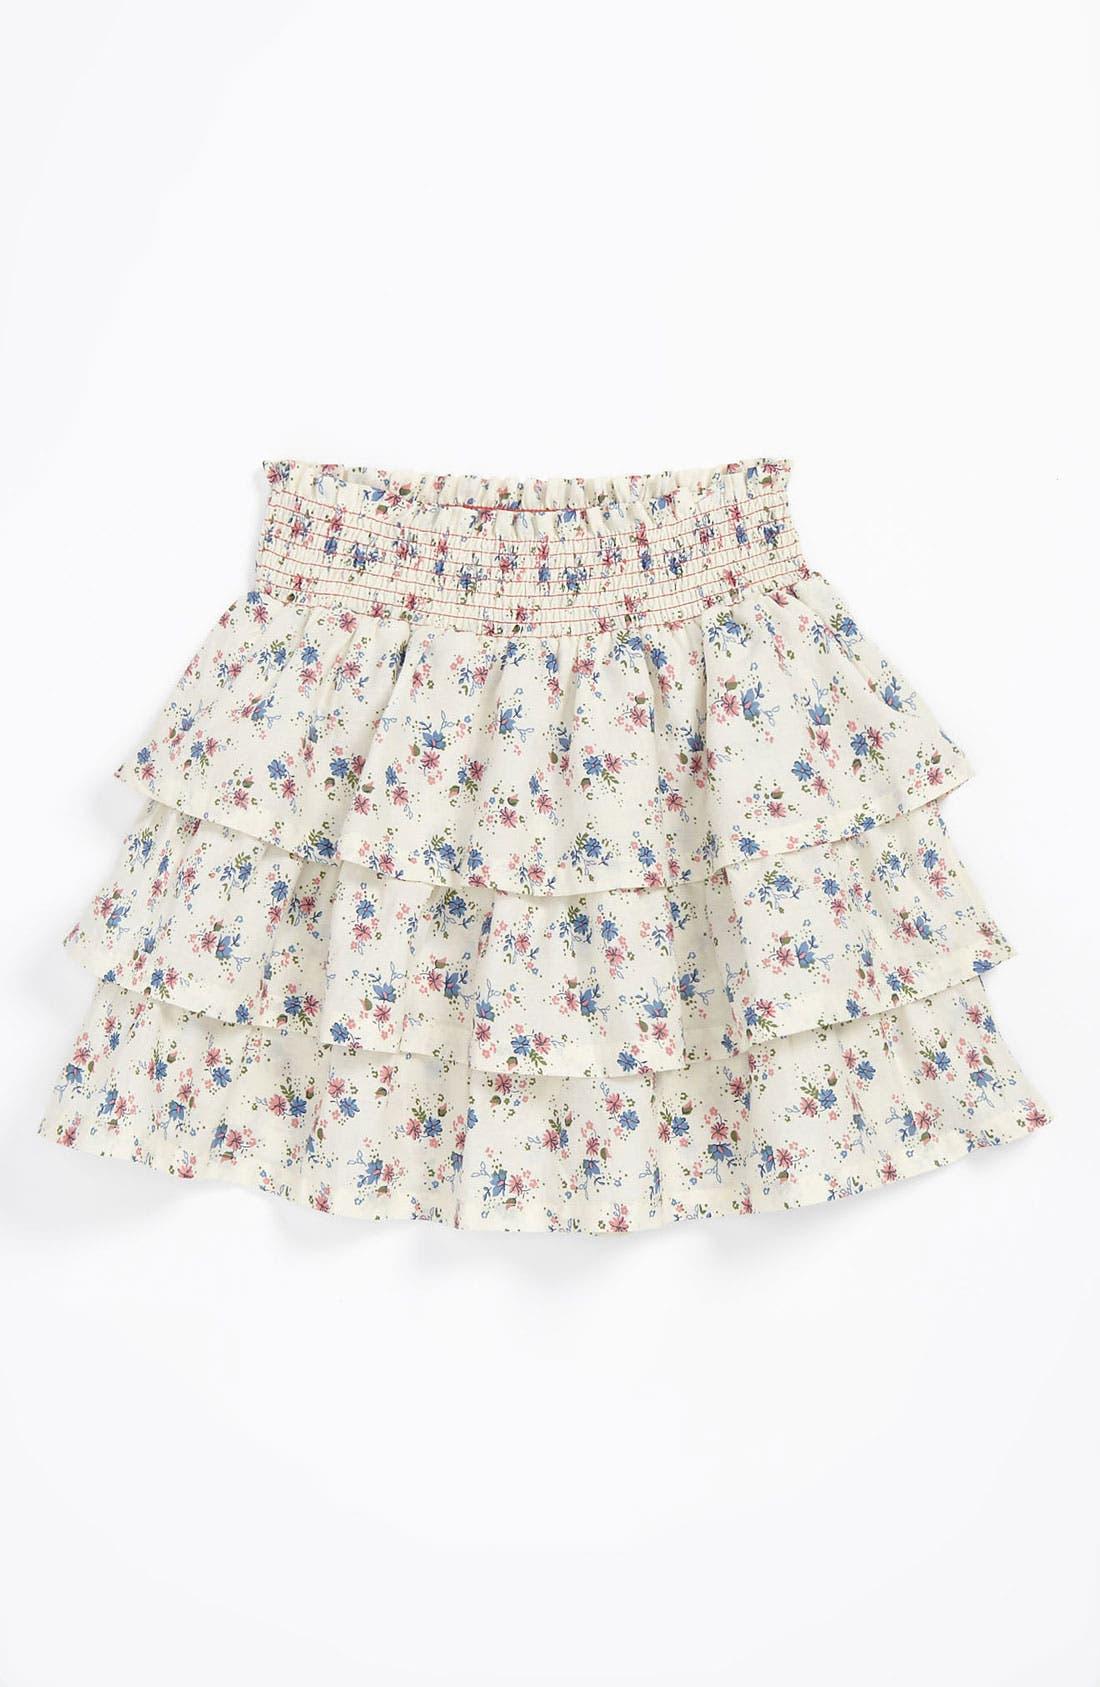 Alternate Image 1 Selected - Tucker + Tate 'Tanya' Skirt (Big Girls)